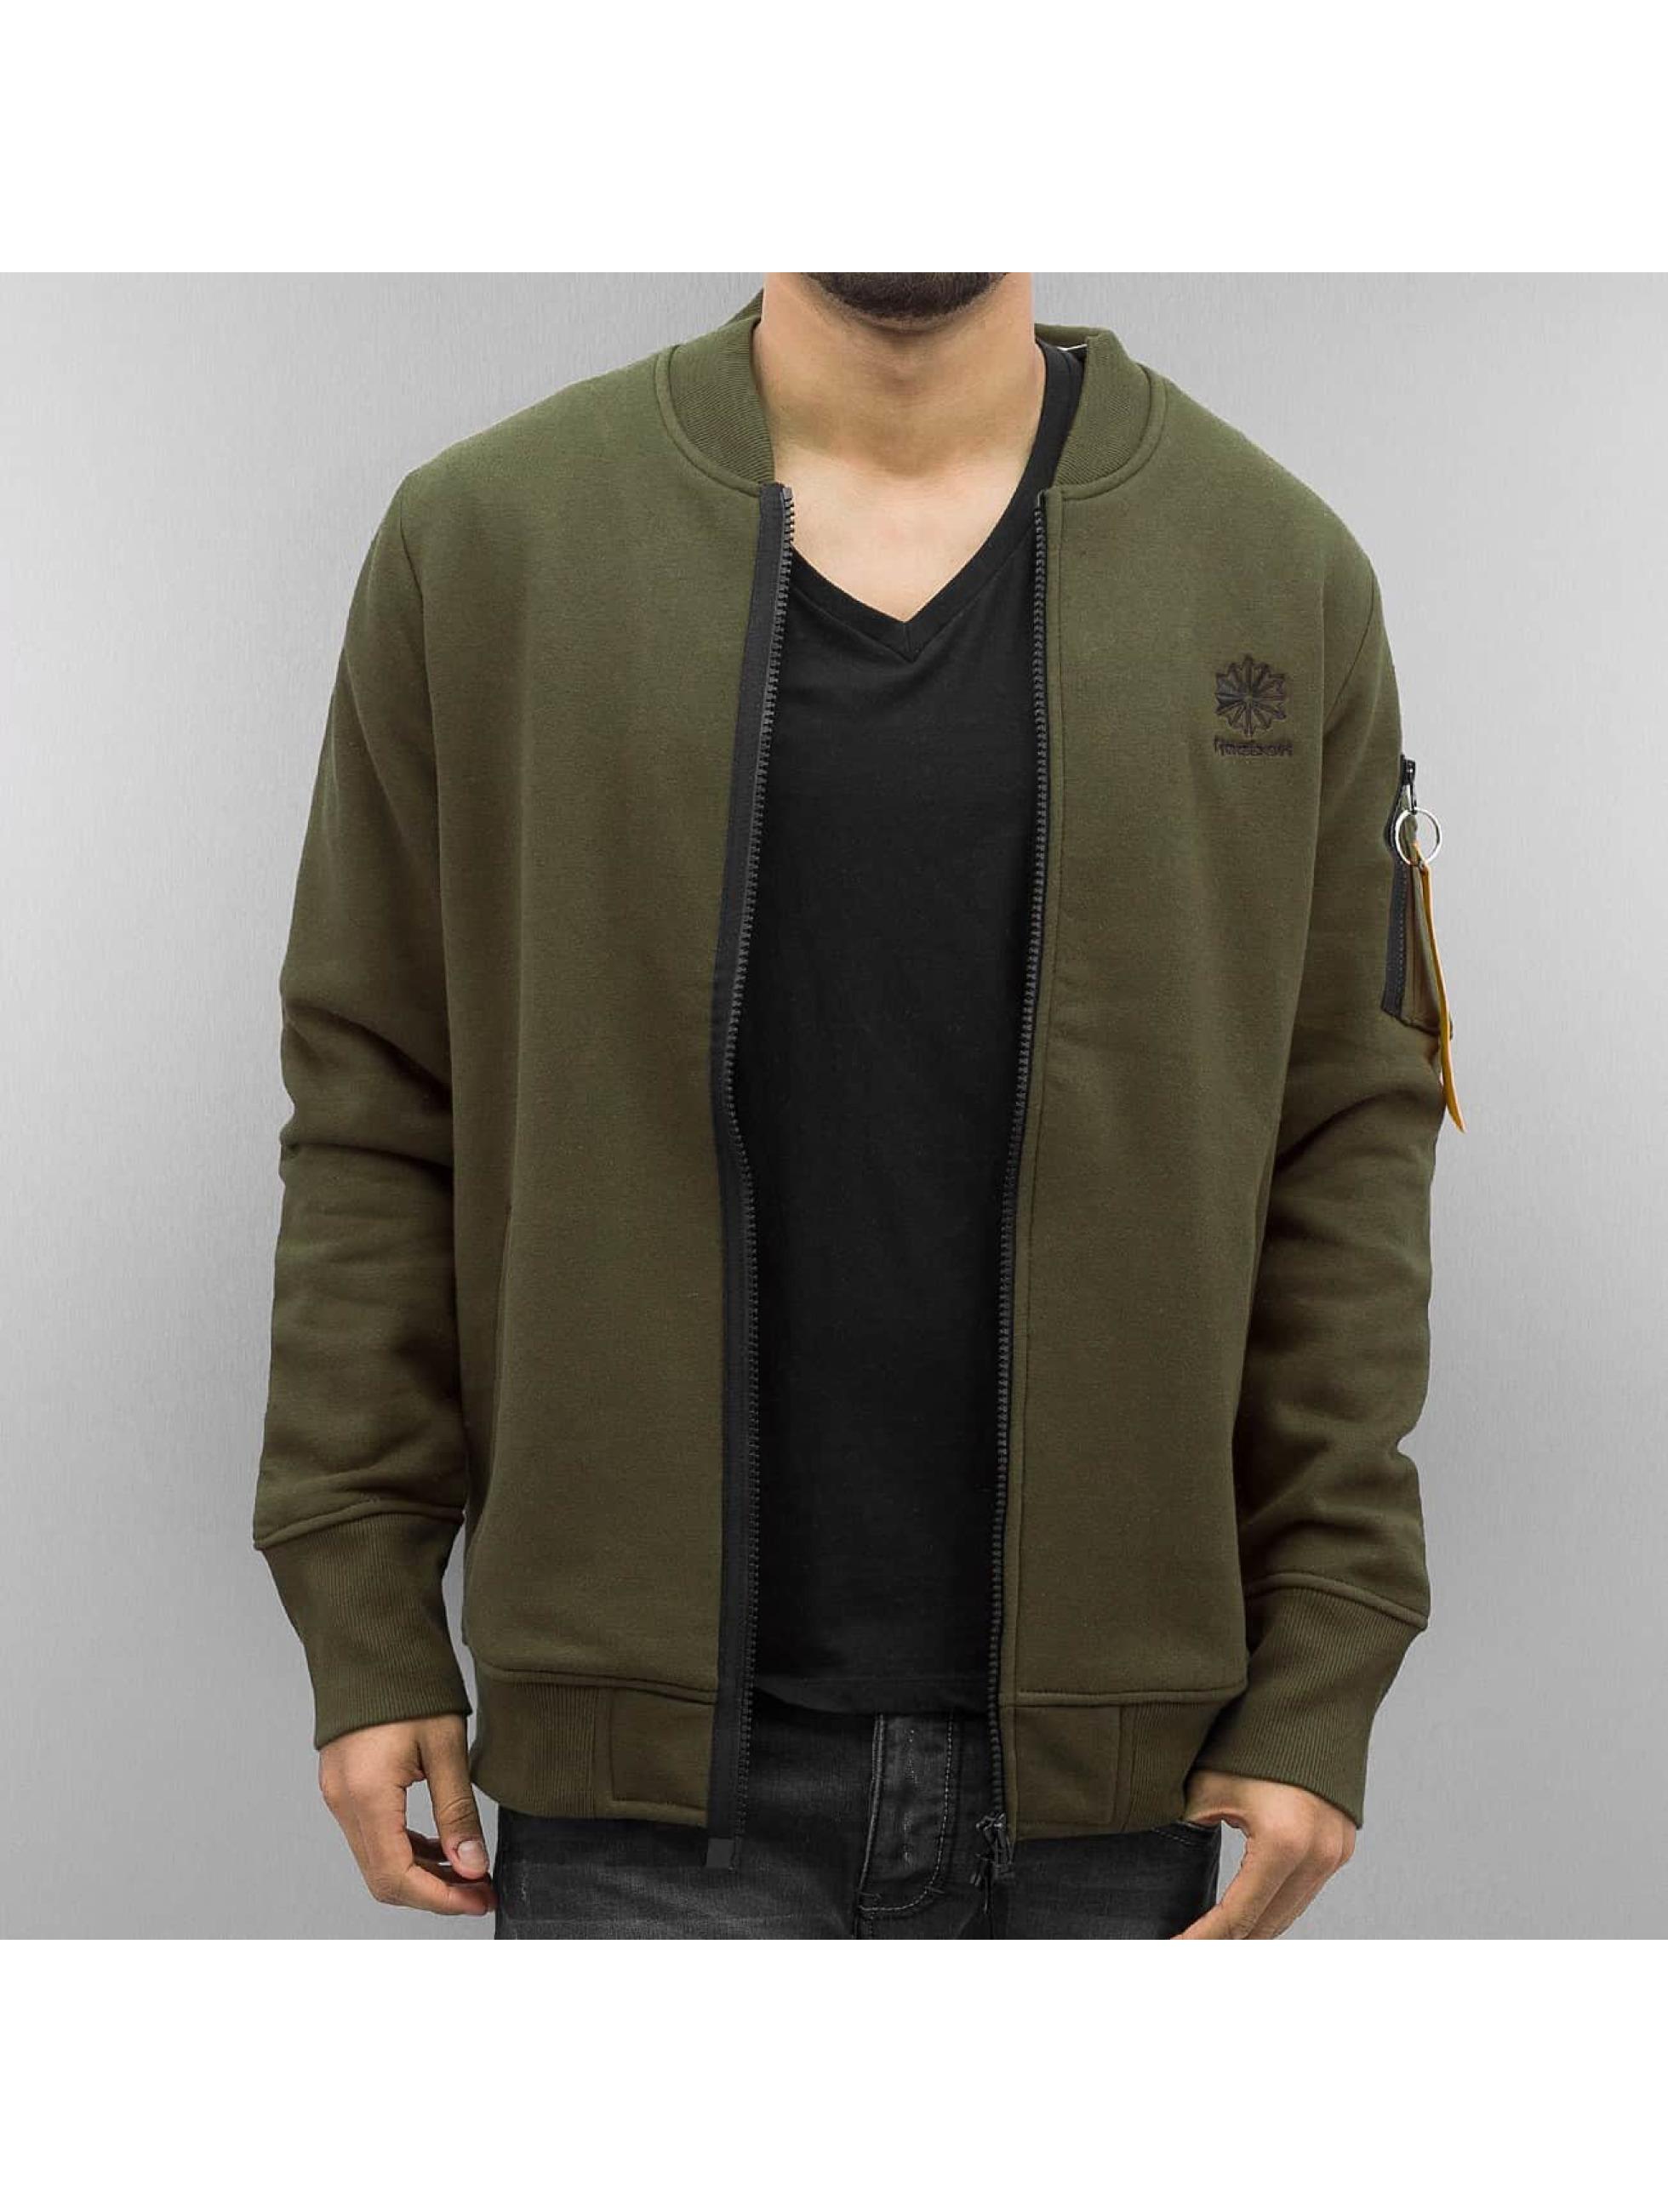 reebok fleece vert homme bomber reebok acheter pas cher manteau veste 325182. Black Bedroom Furniture Sets. Home Design Ideas